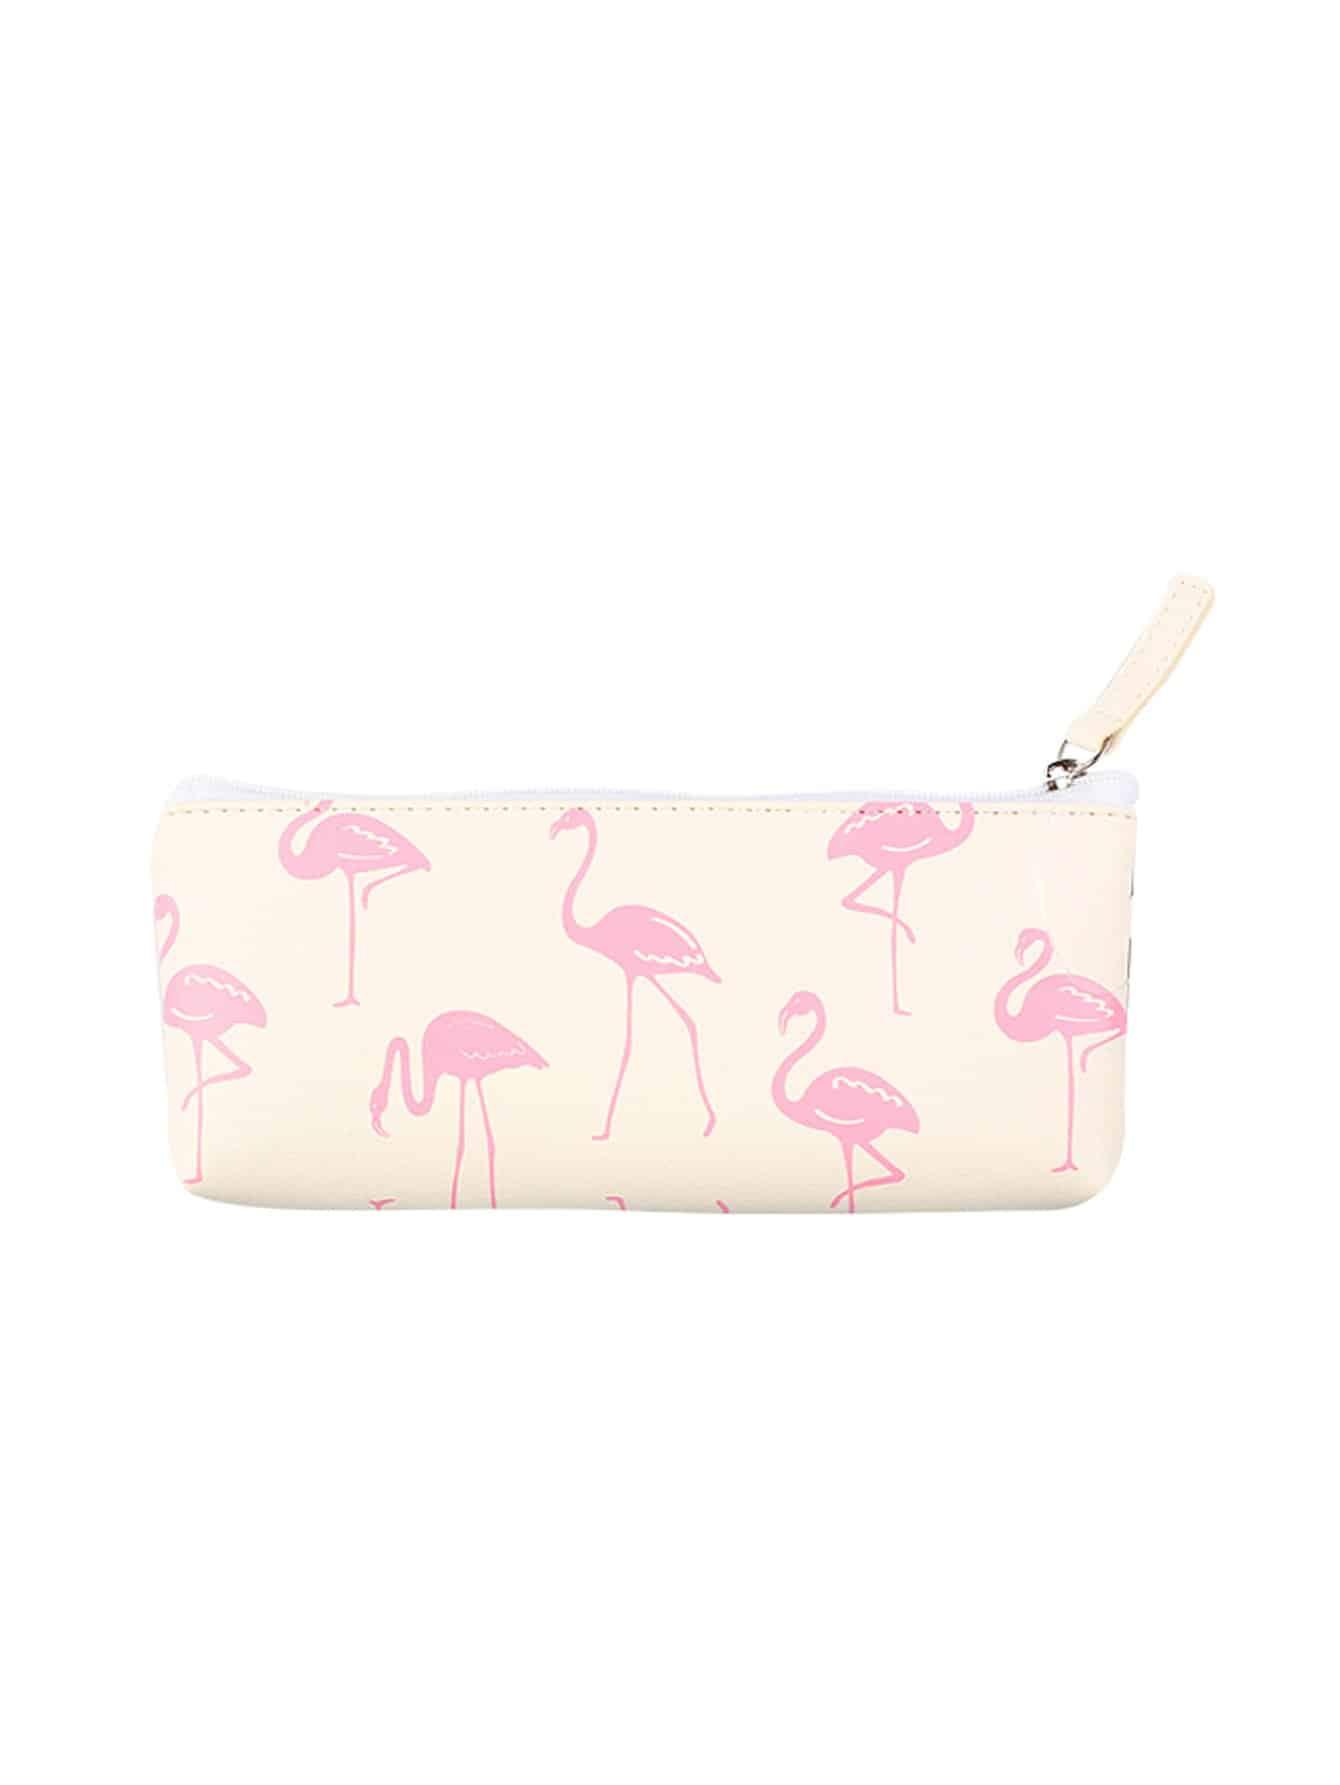 Flamingo Overlay Pencil Case strawberry overlay pencil case